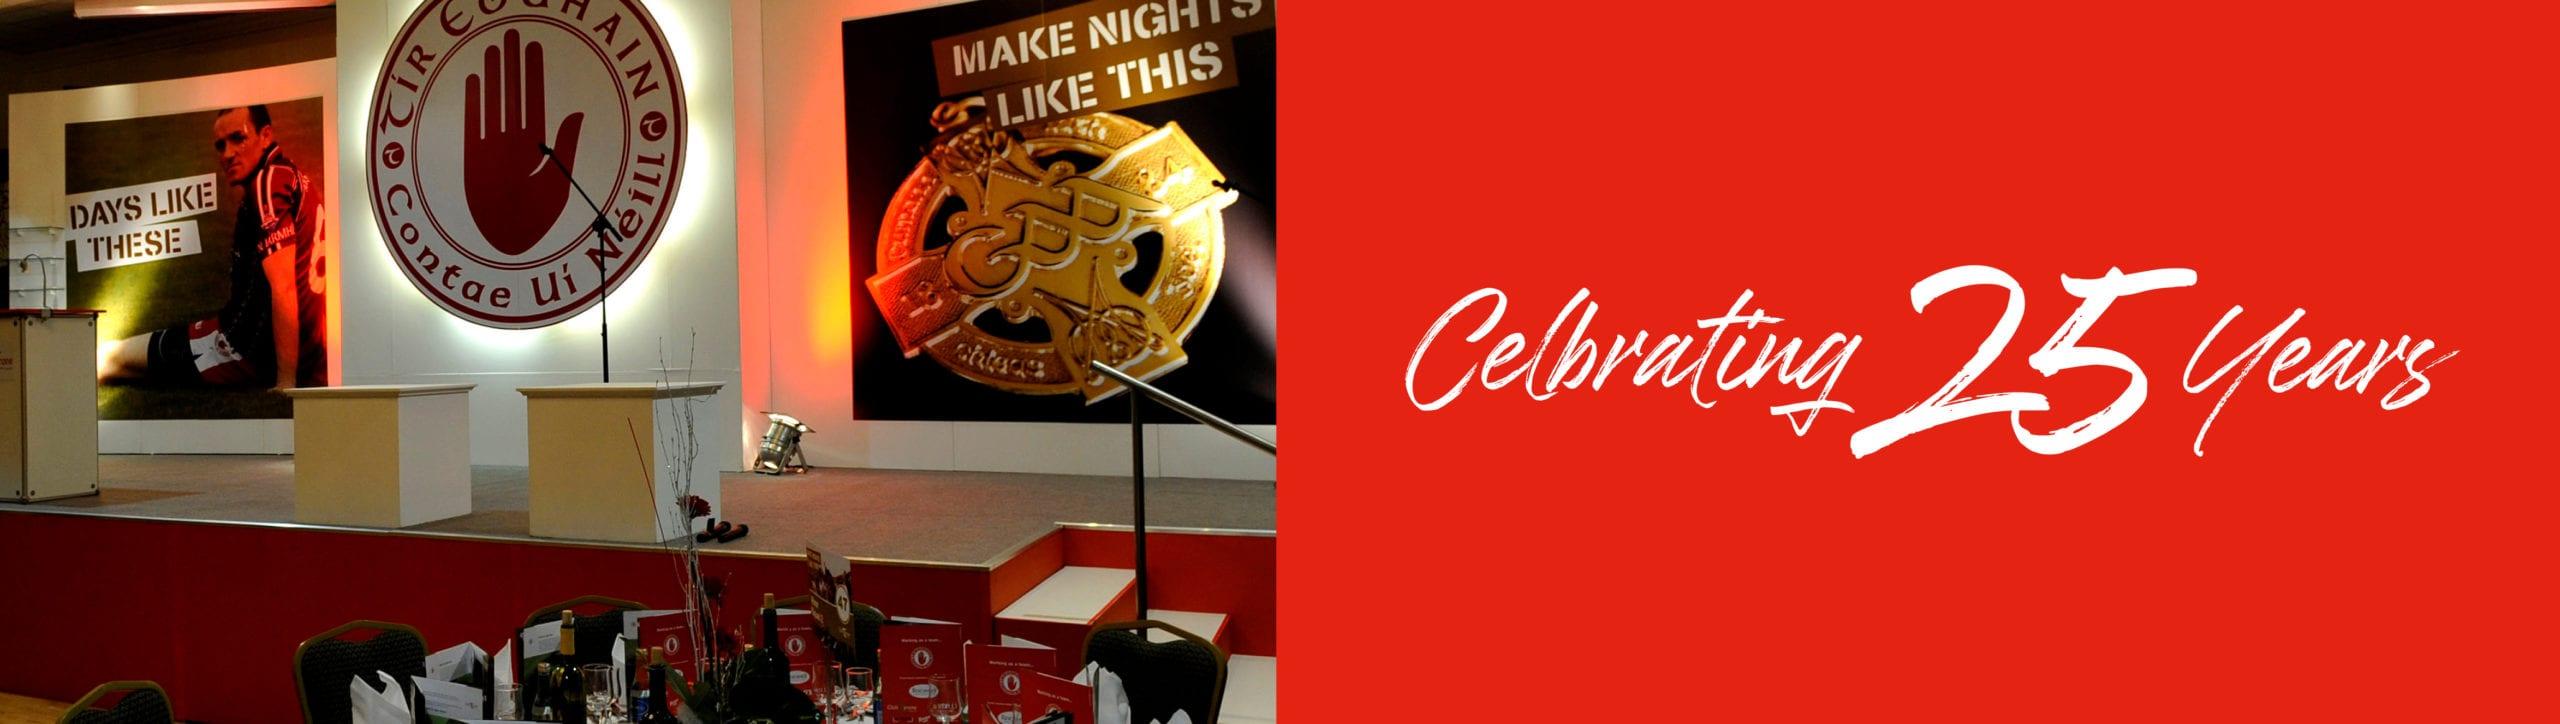 Club Tyrone - Celebrating 25 years